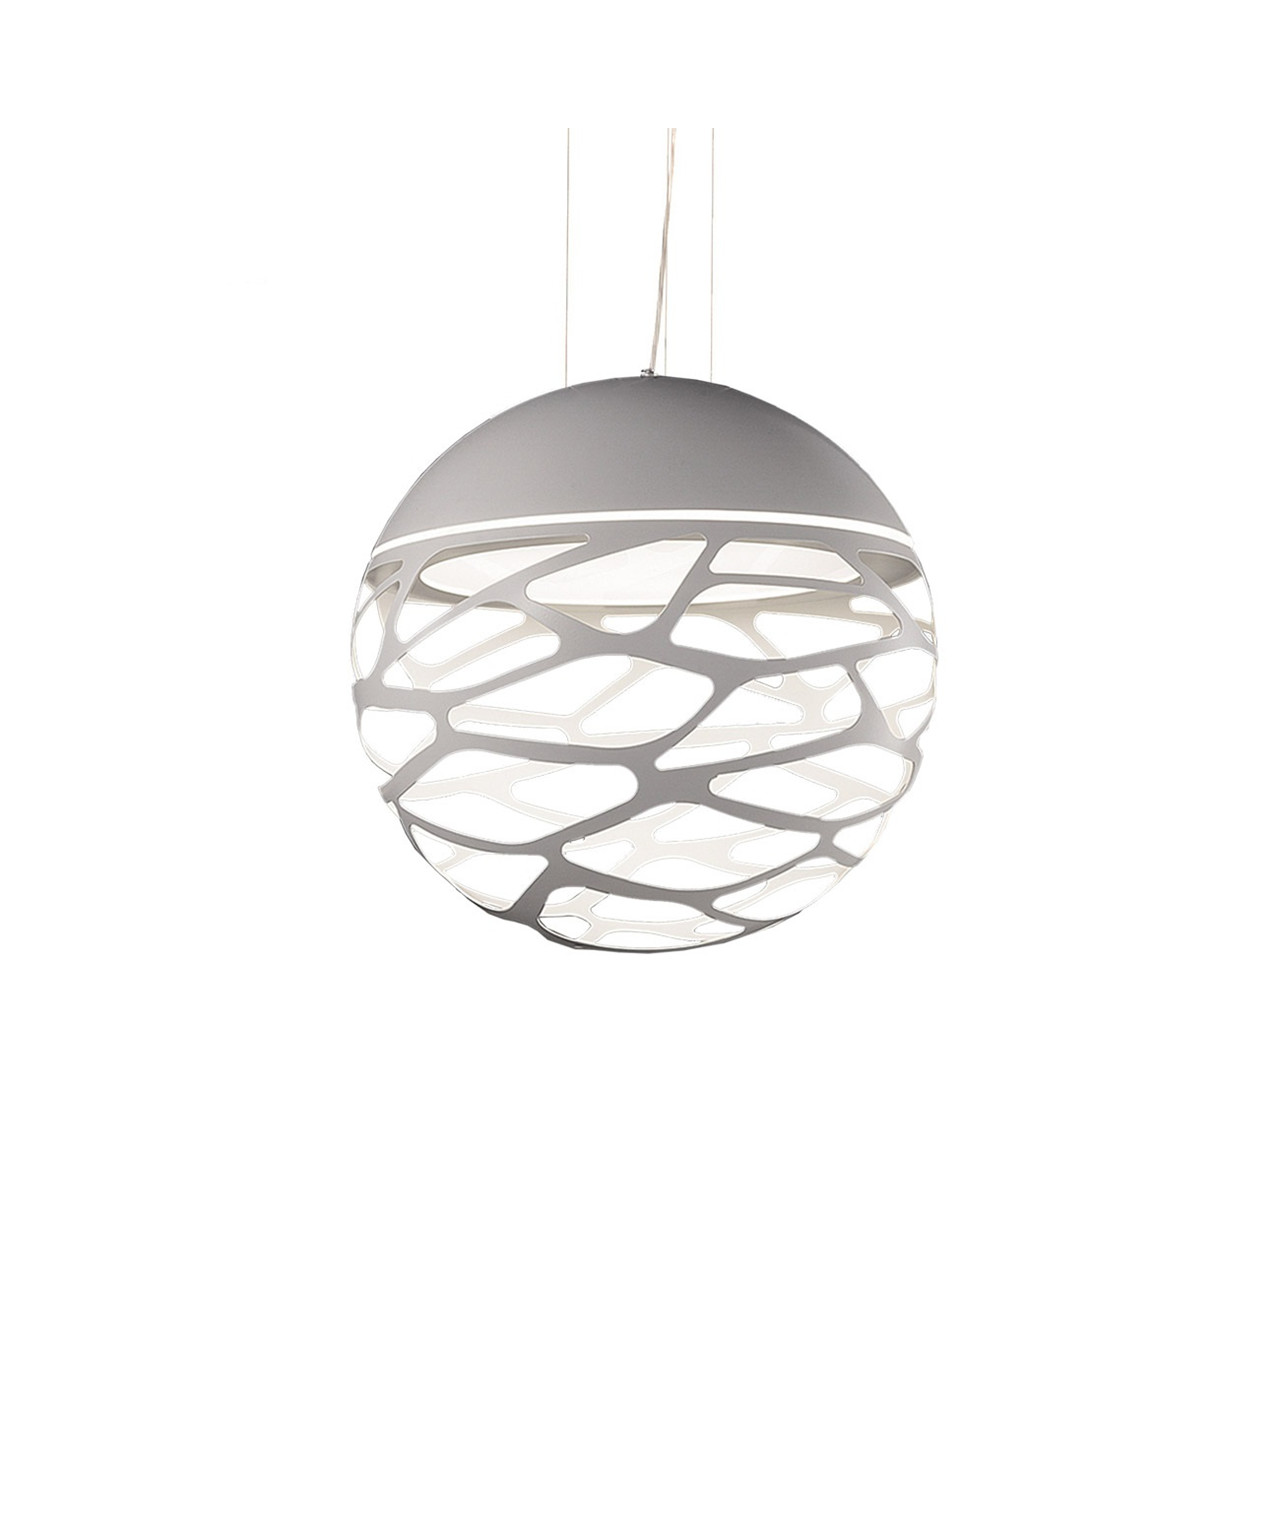 Image of   Kelly SO2 Small Sphere Pendel Hvid - Studio Italia Design